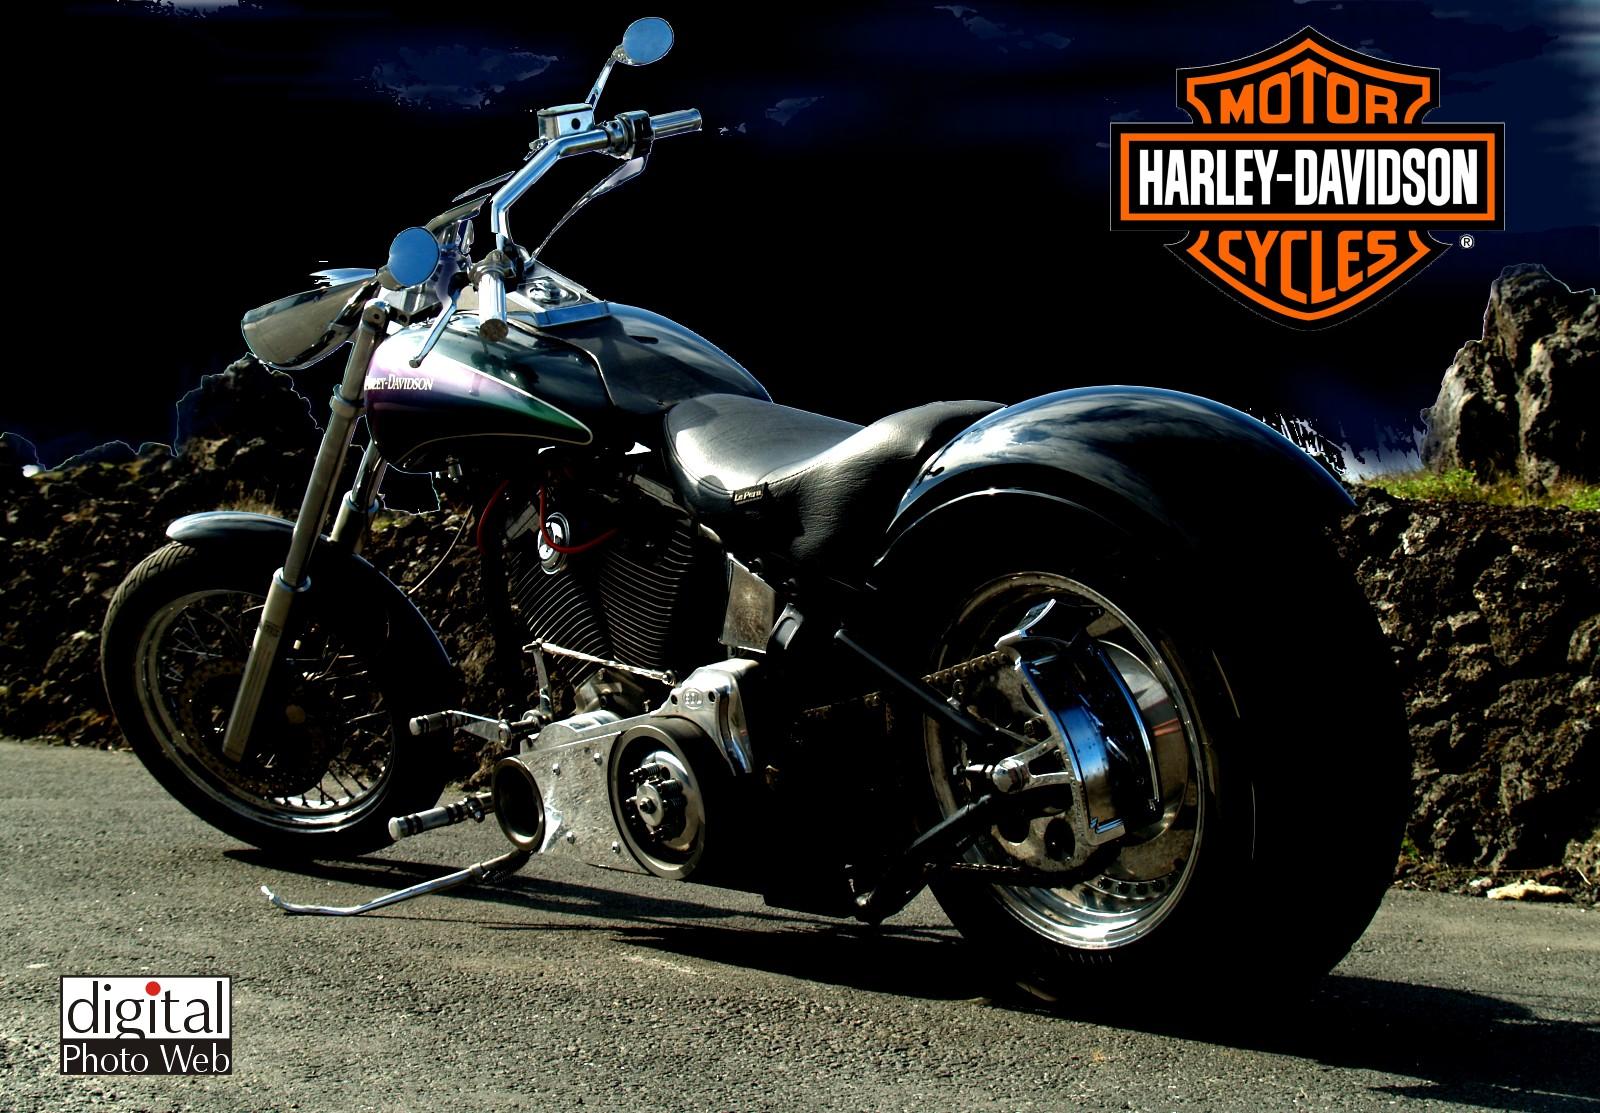 Gambar Gambar Motor Harley Davidson  Gambar Unik Keren